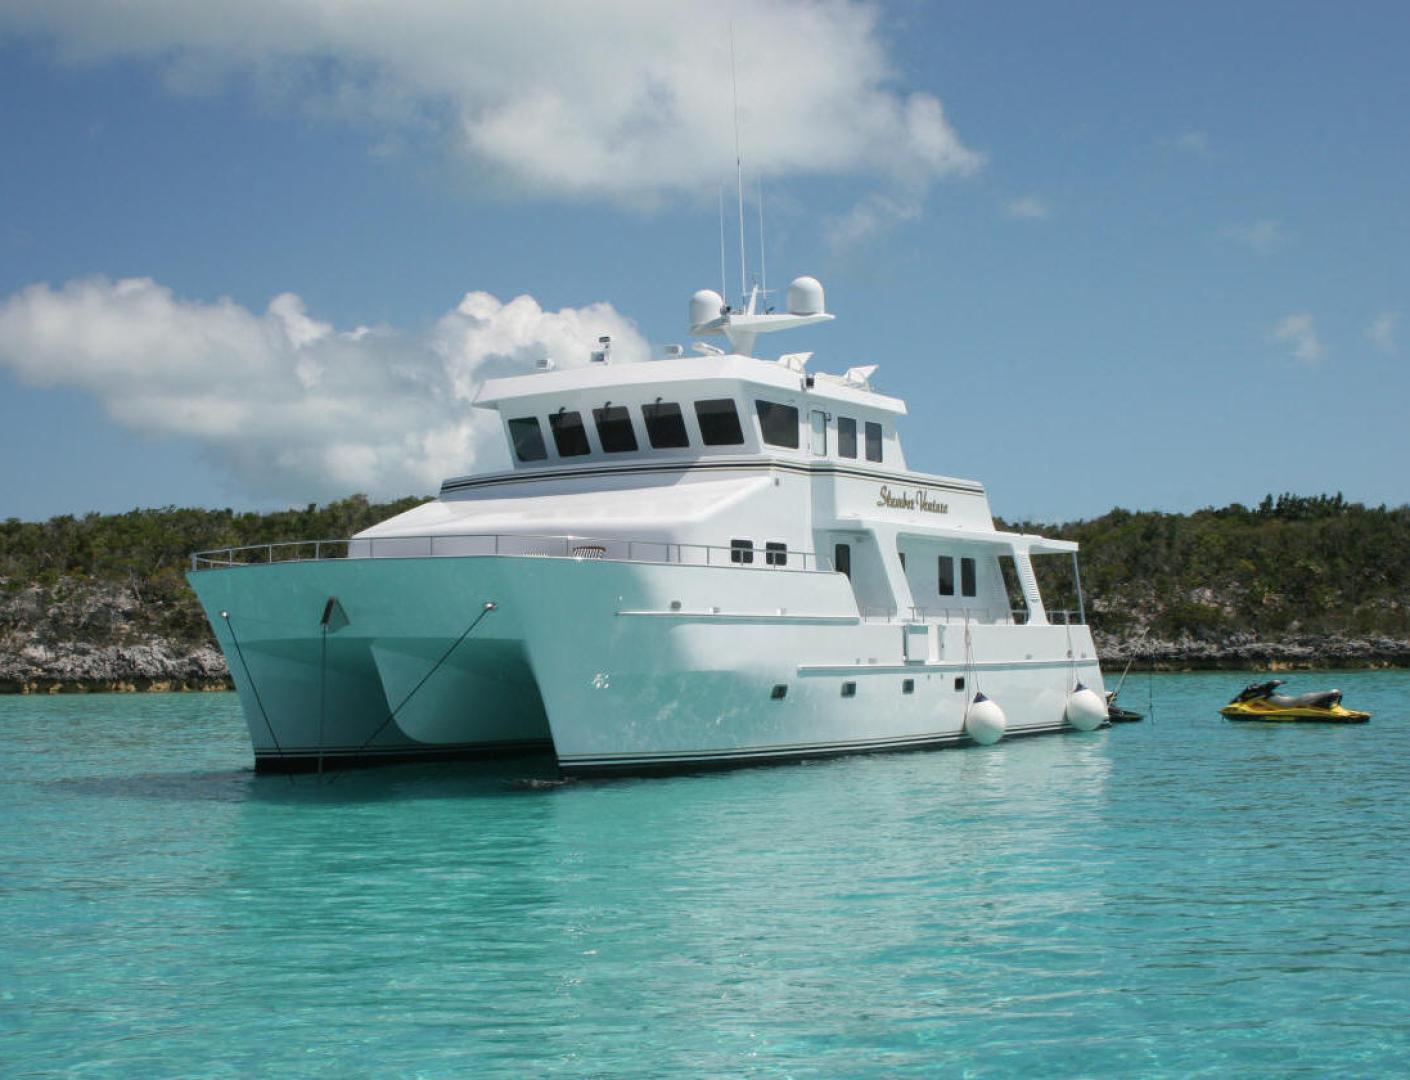 Theriault & Son-Custom Catamaran 2000-Slumber Venture Fort Lauderdale-Florida-United States-1604557 | Thumbnail